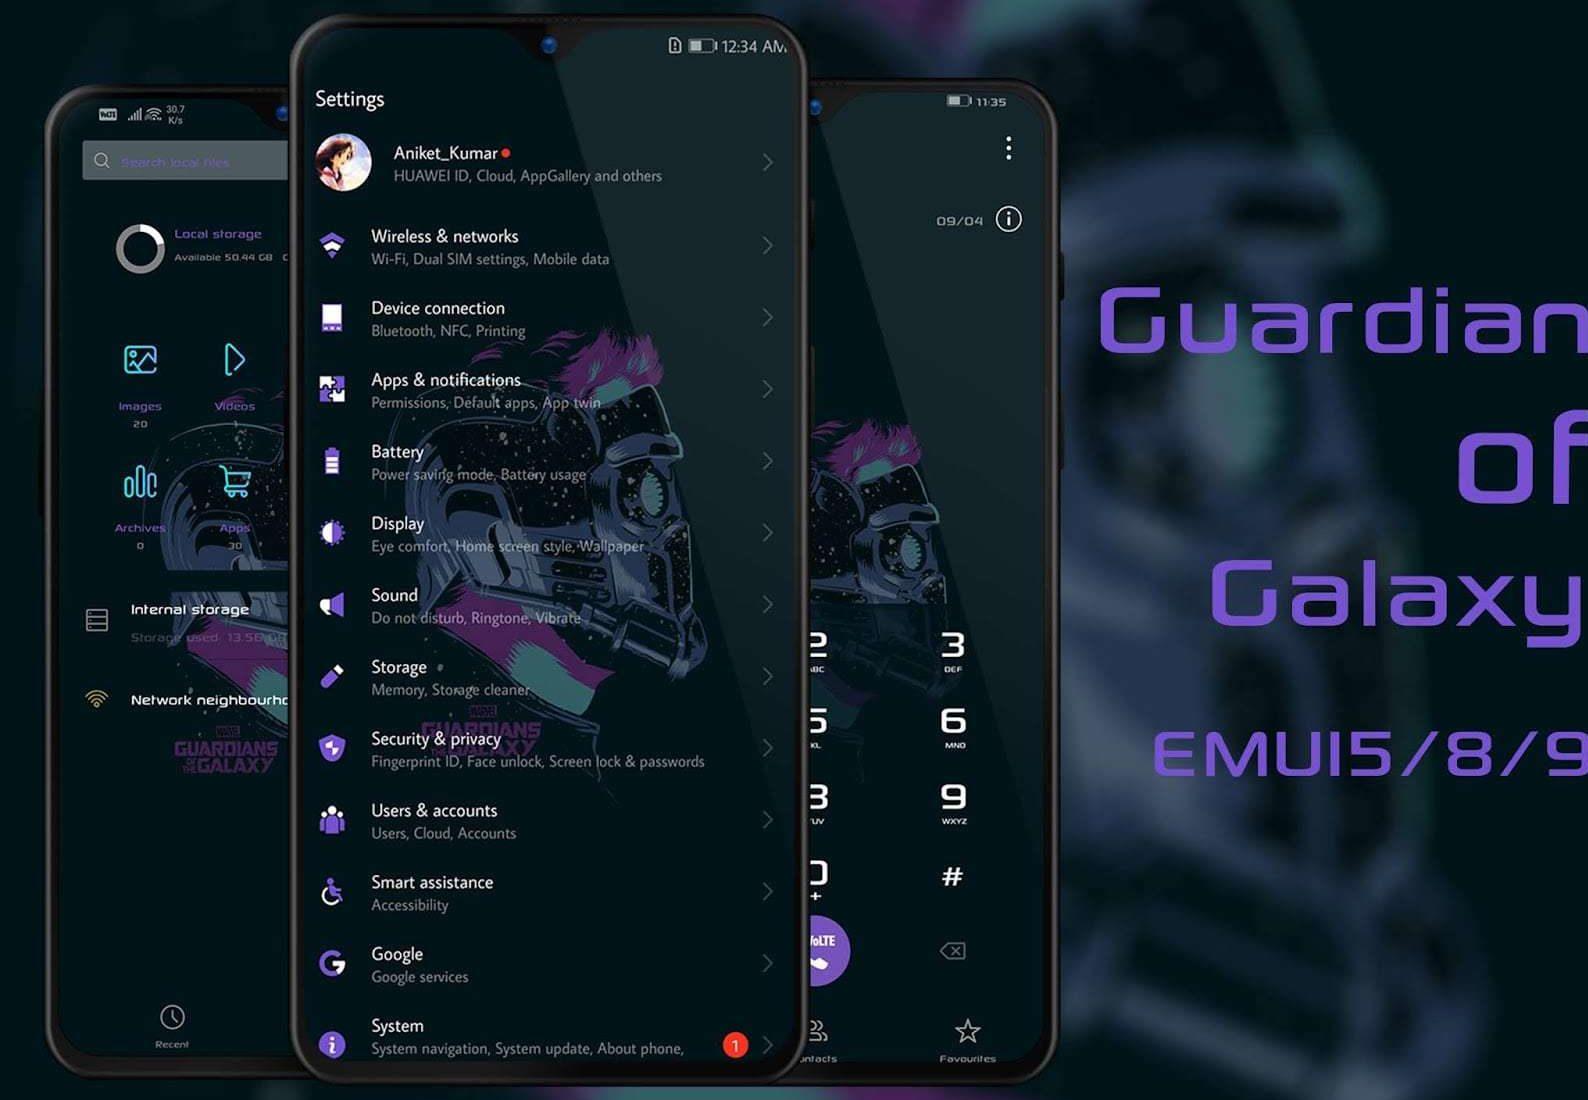 Guardian of Galaxy Theme